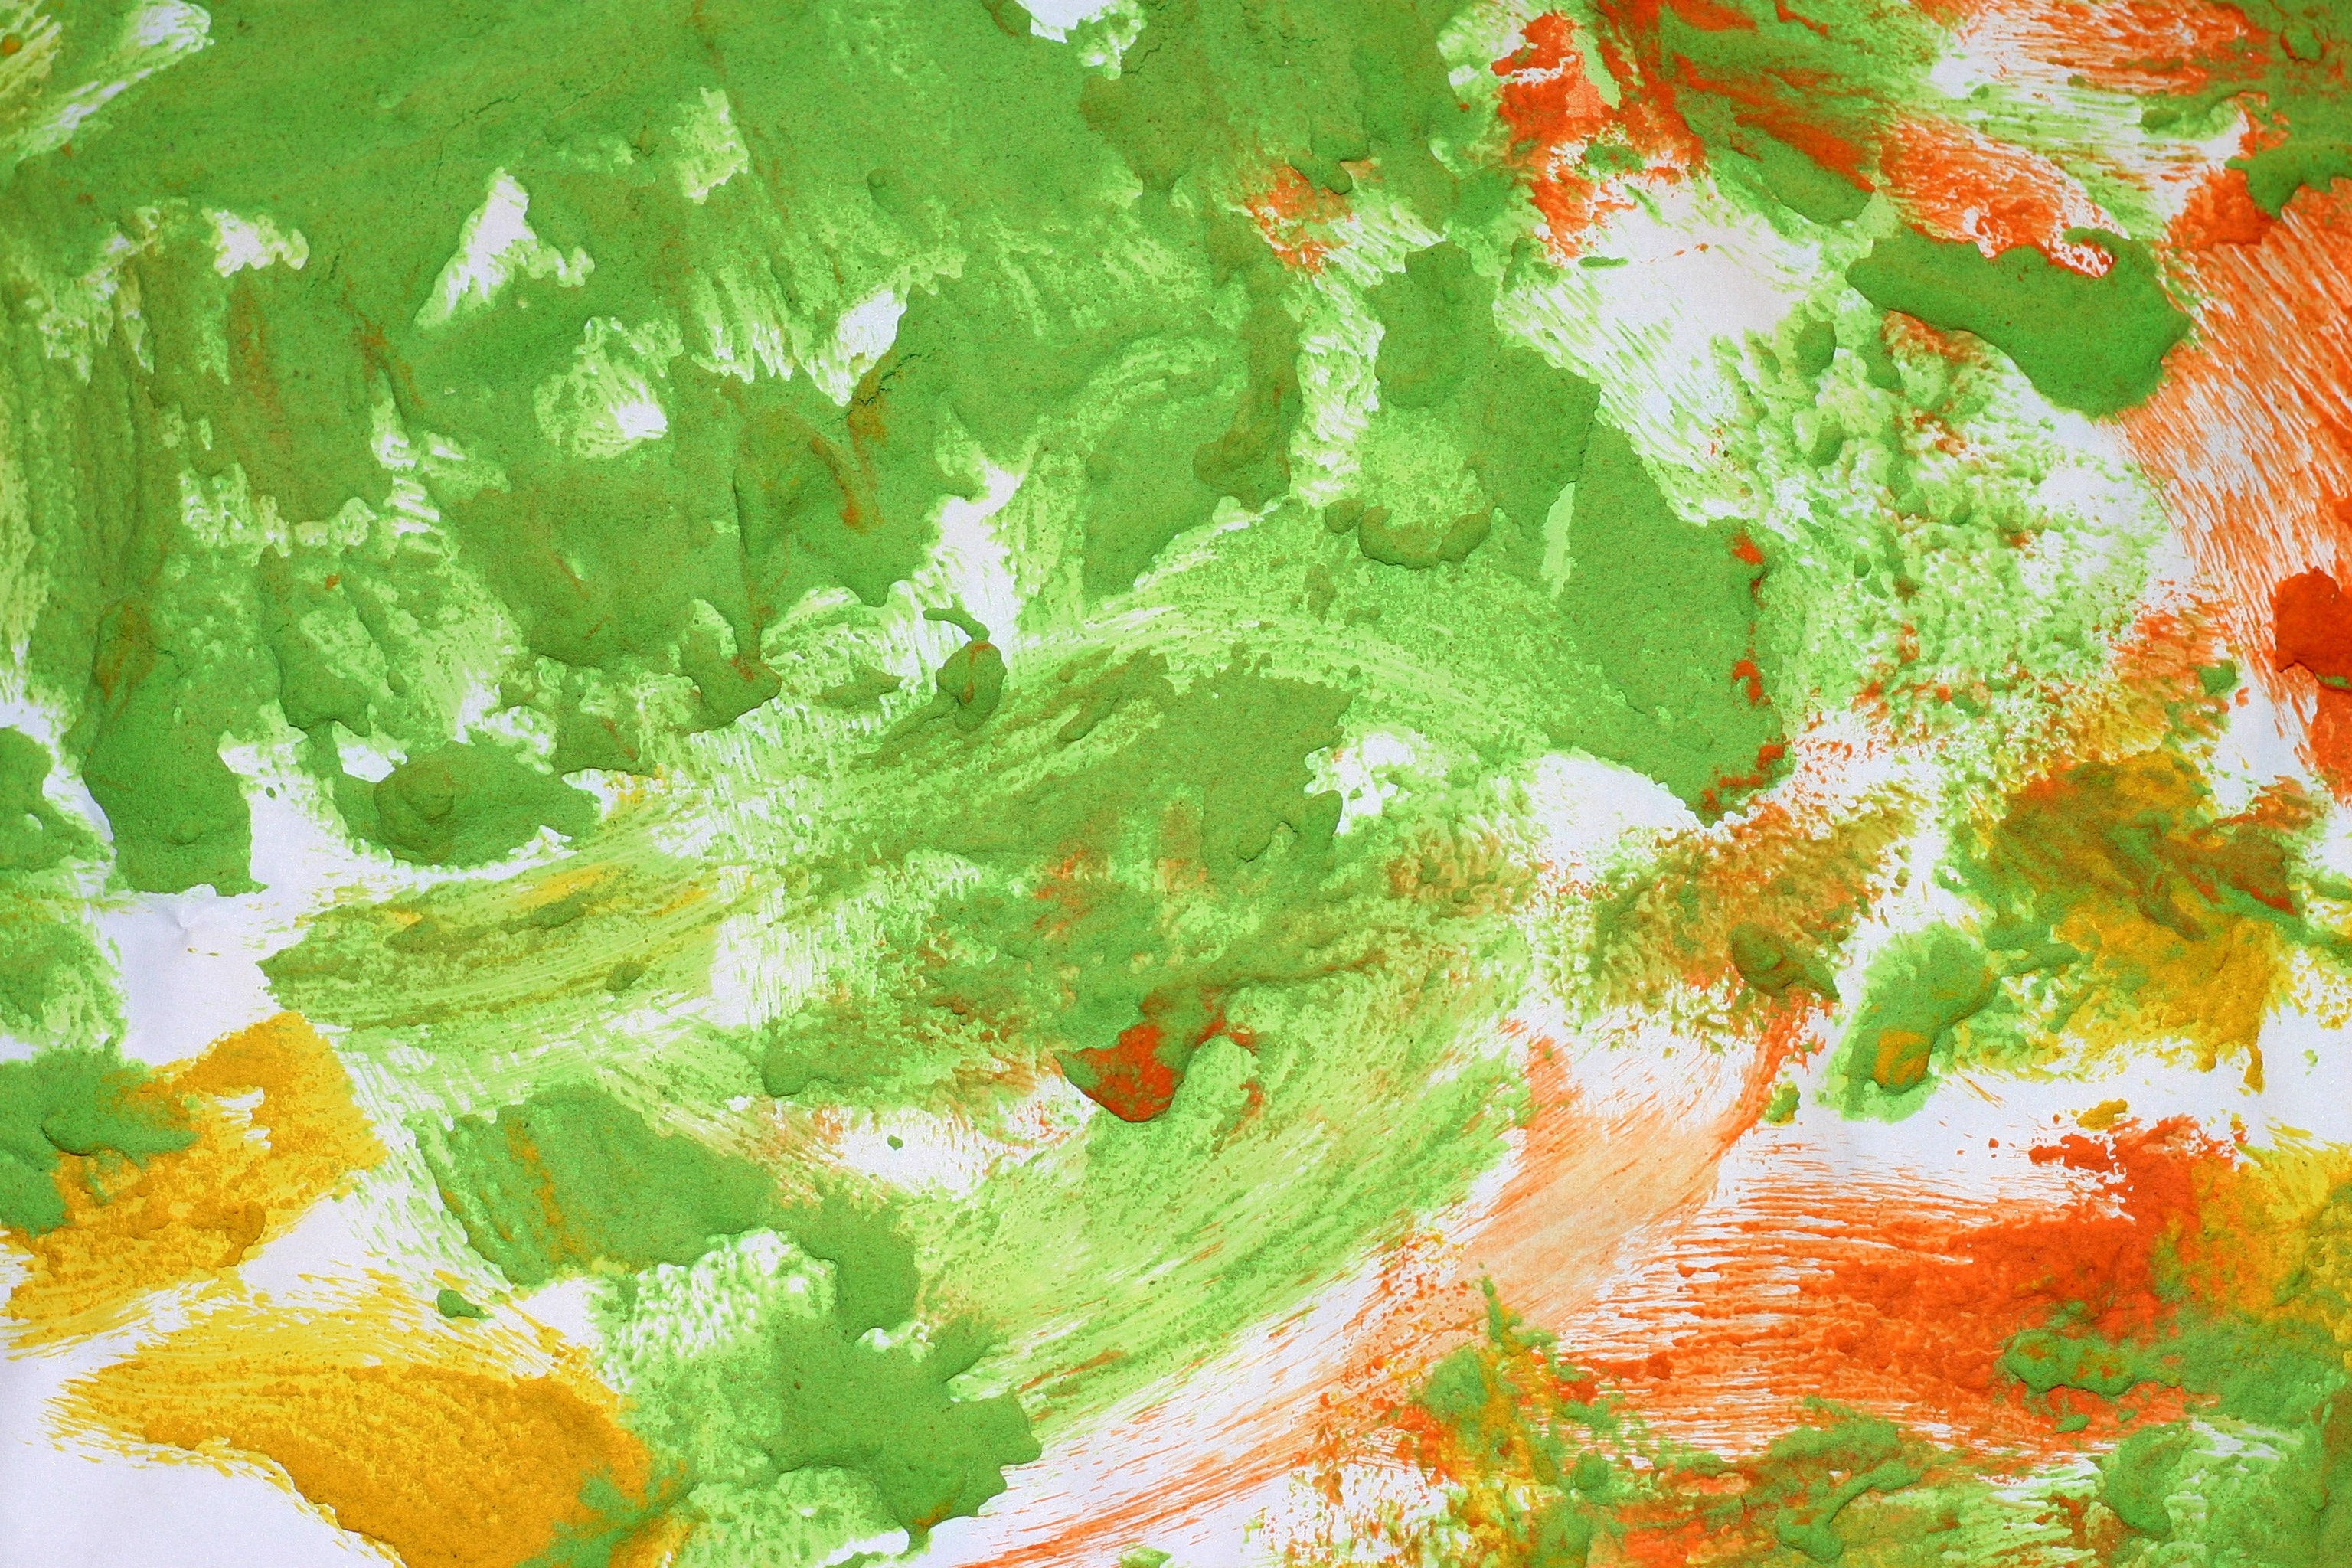 21+ Green Textures, Photoshop Textures, Patterns   FreeCreatives